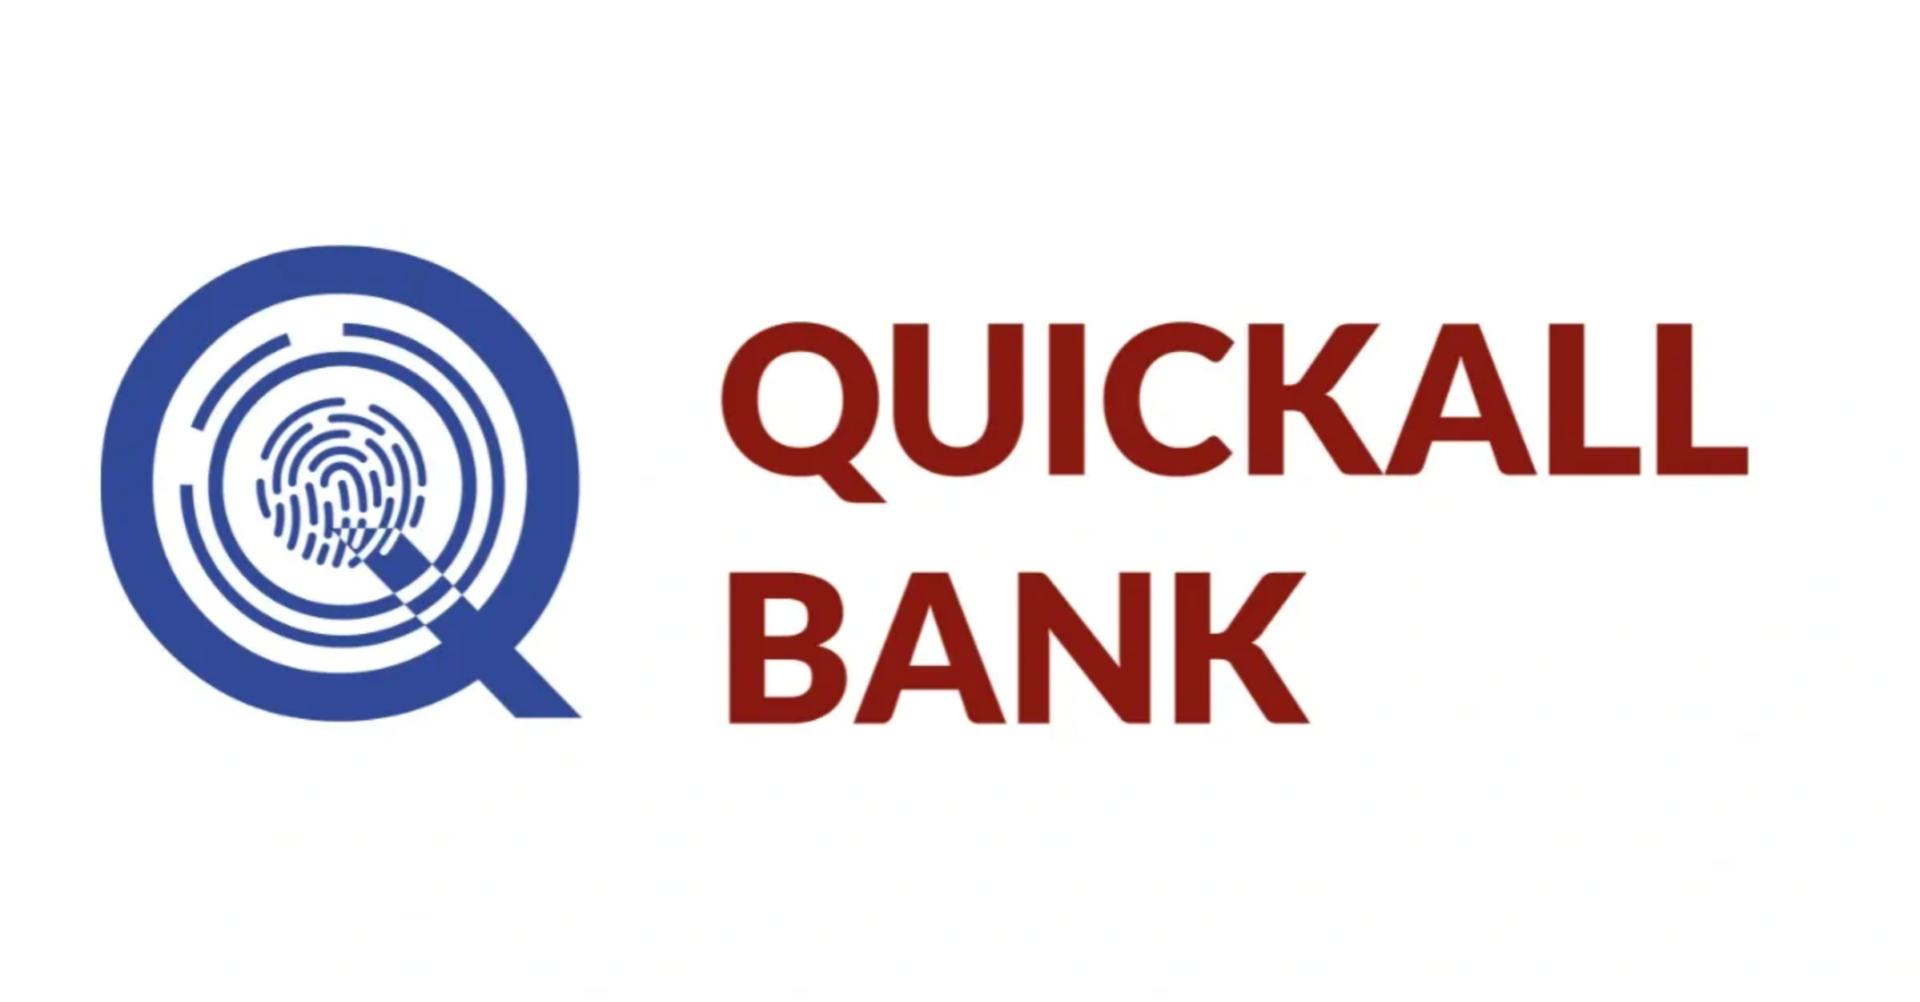 Introducing Quickall Bank, A Next Generation Bank